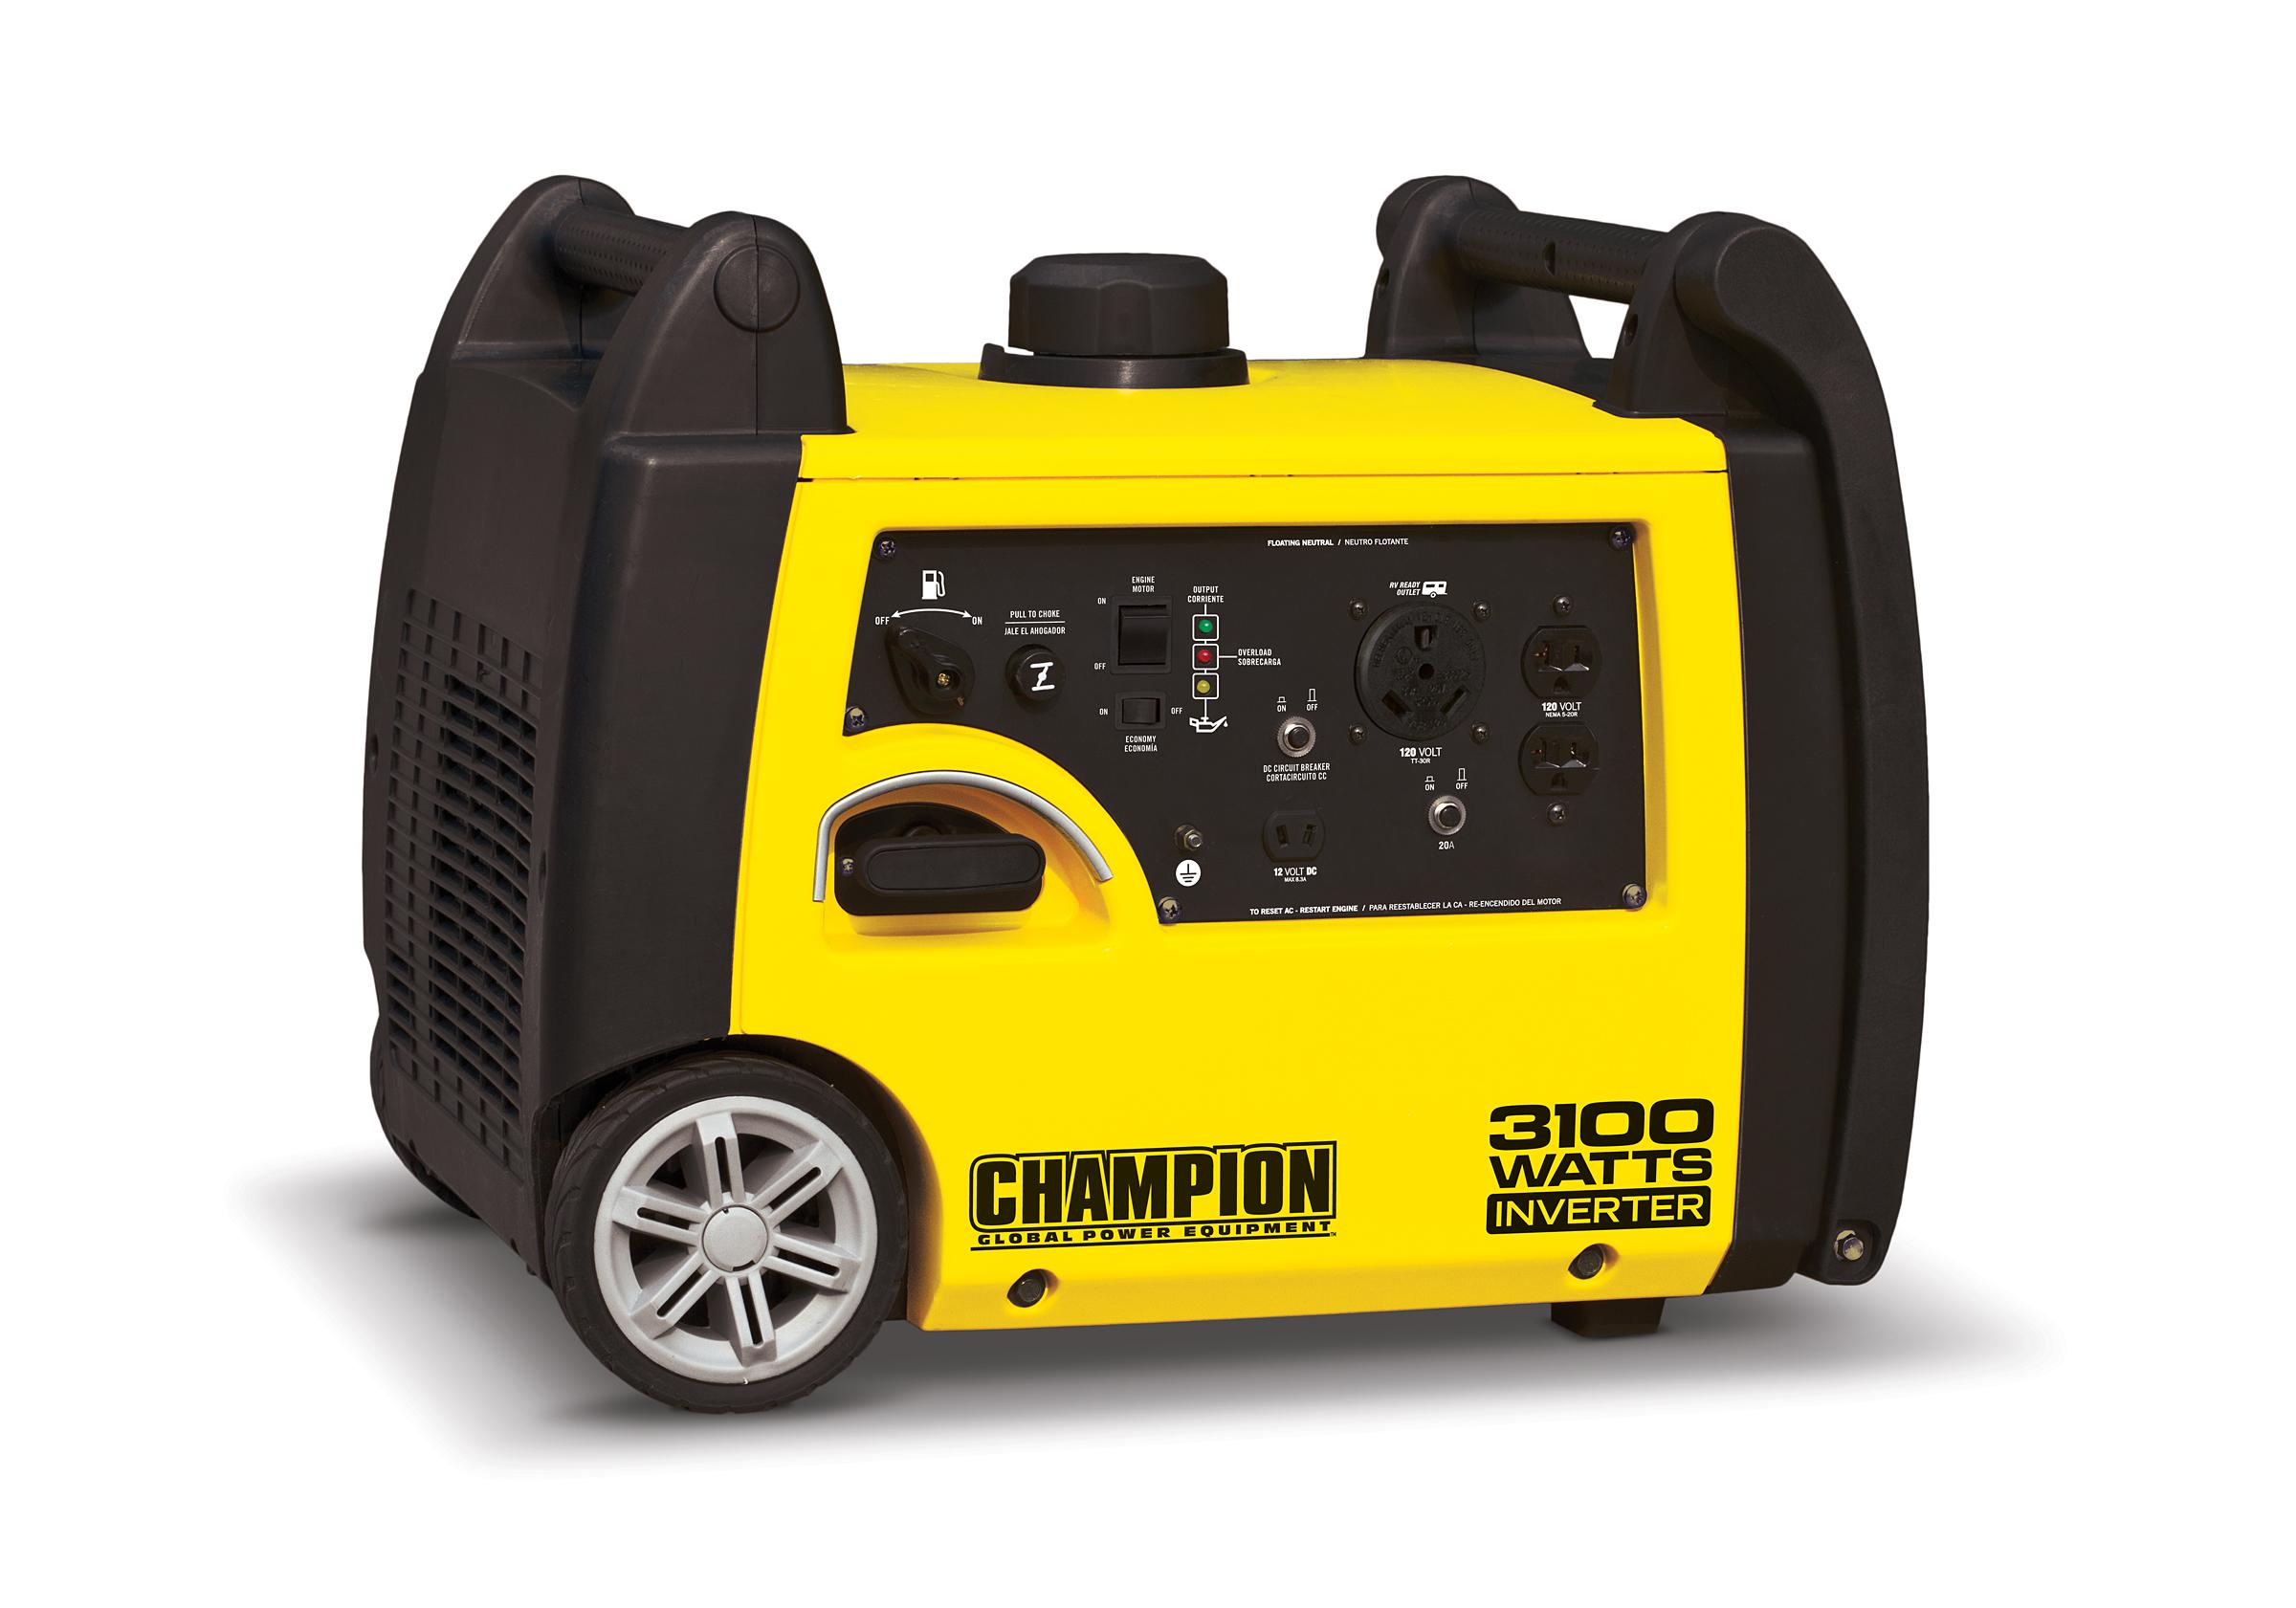 Champion Inverter Generator 3100 Watt Idle Control 58 dB